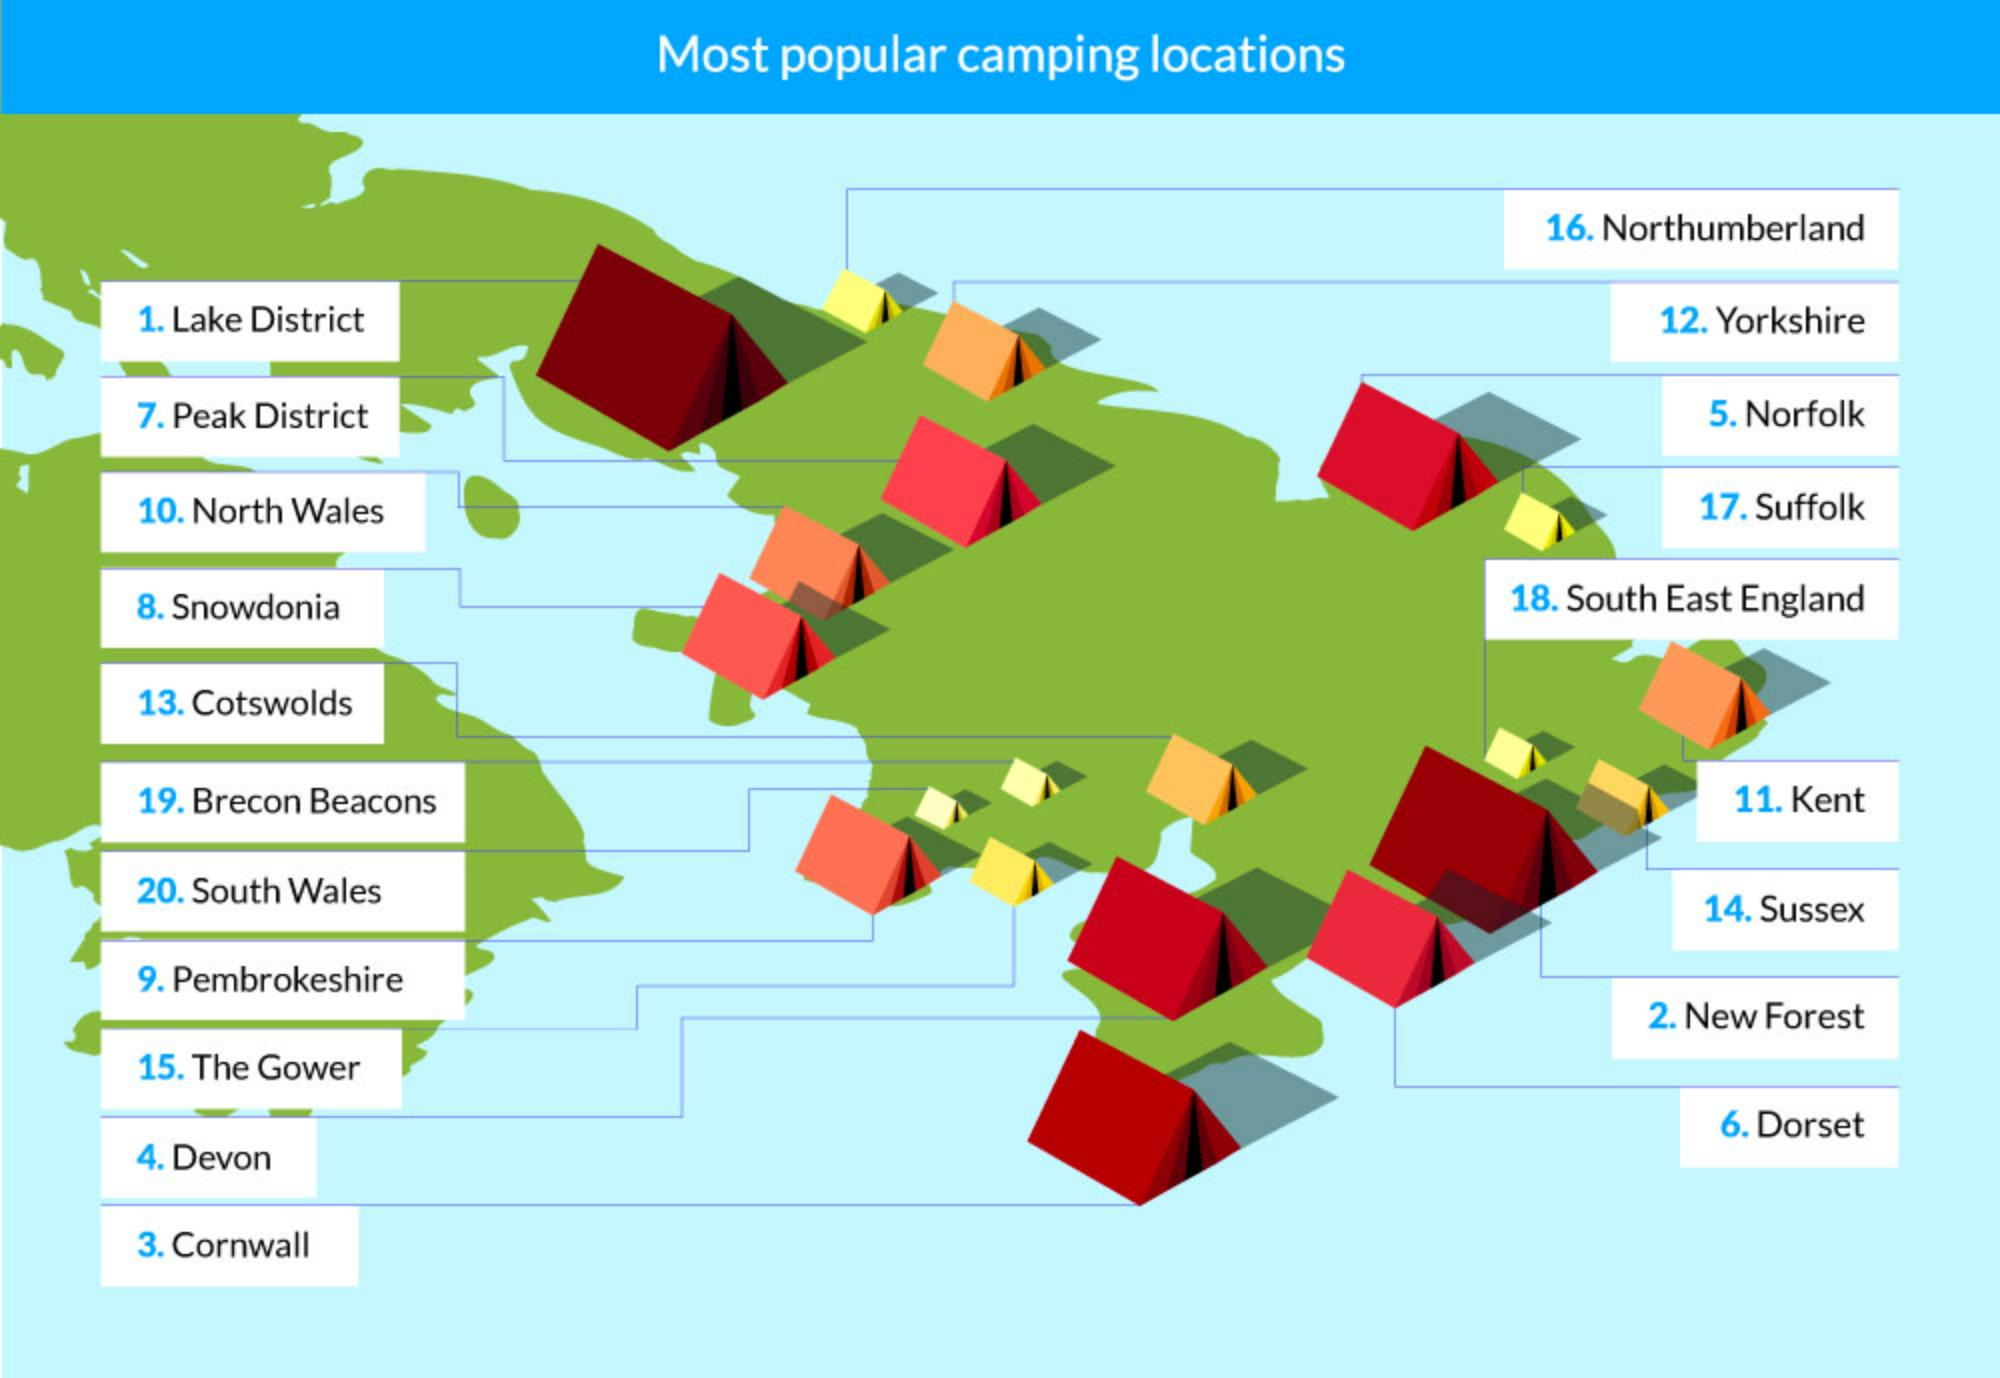 Most popular locations